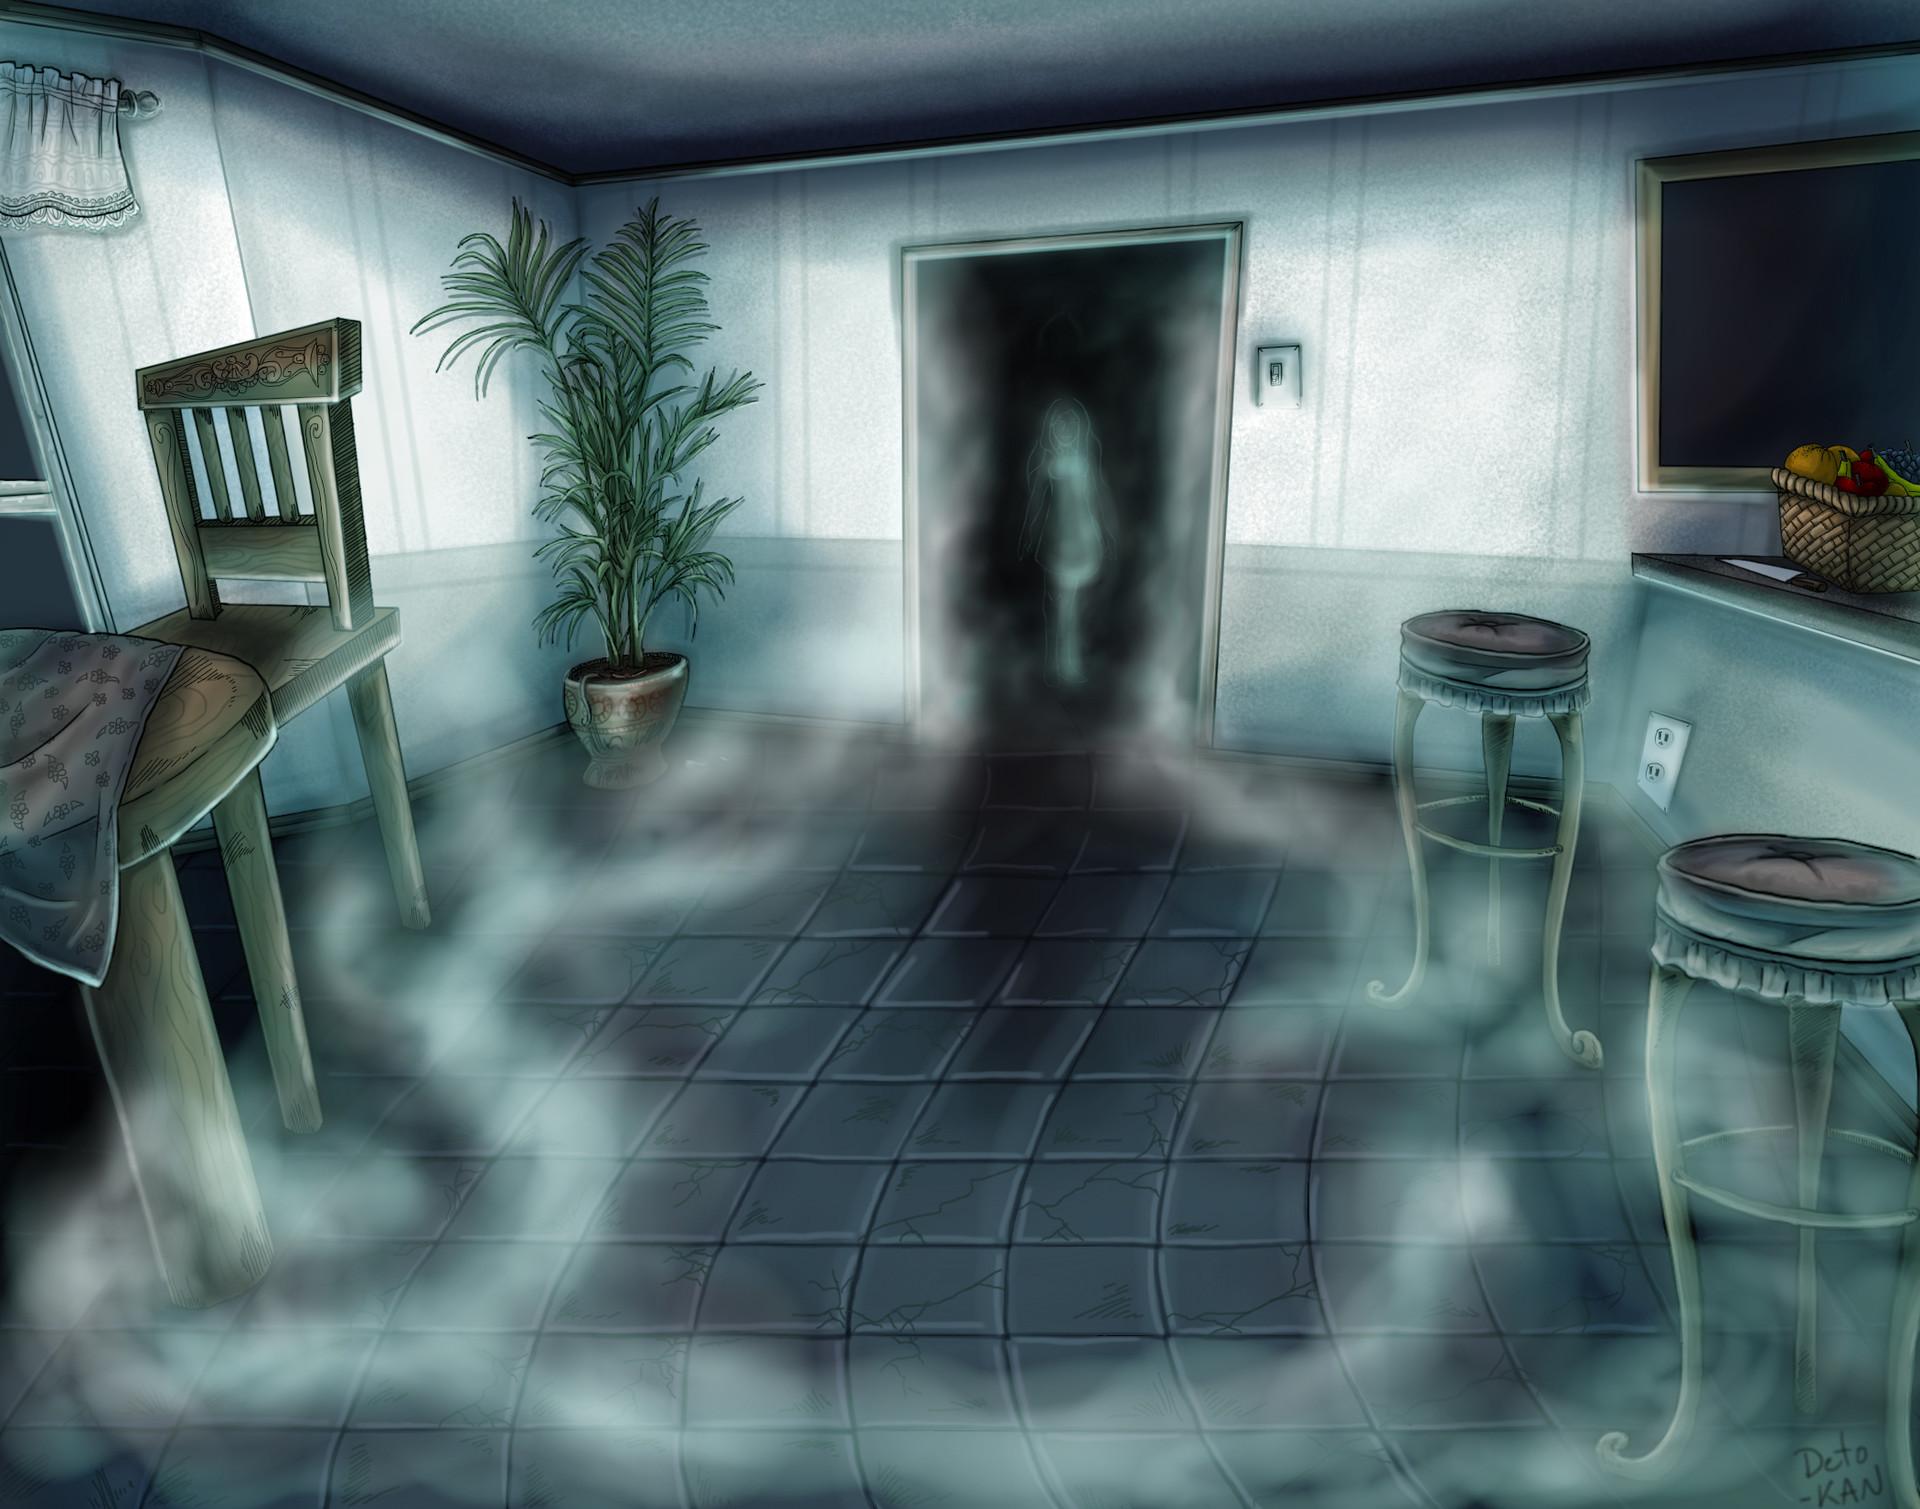 Detonya kan entry 18 kitchendoor portal